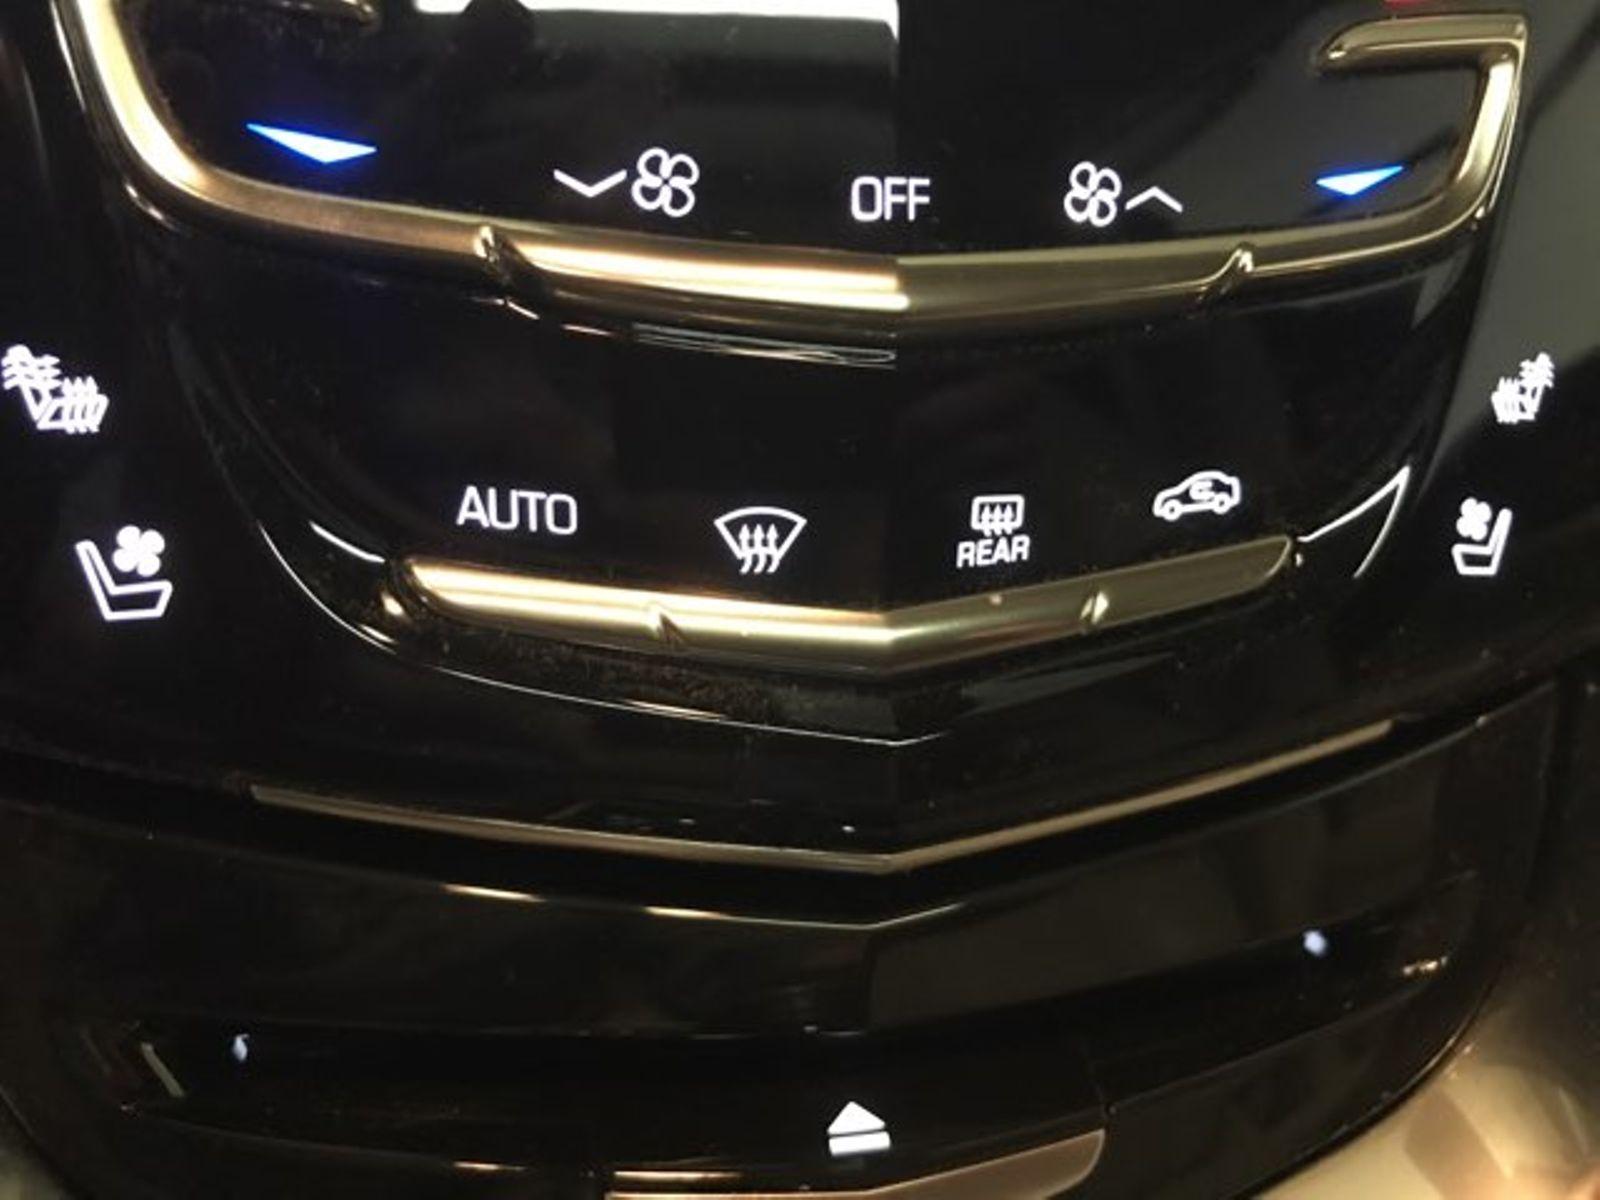 2013 Cadillac Srx Premium Collection City Oklahoma Raven Auto Sales Rear Fuse Box In